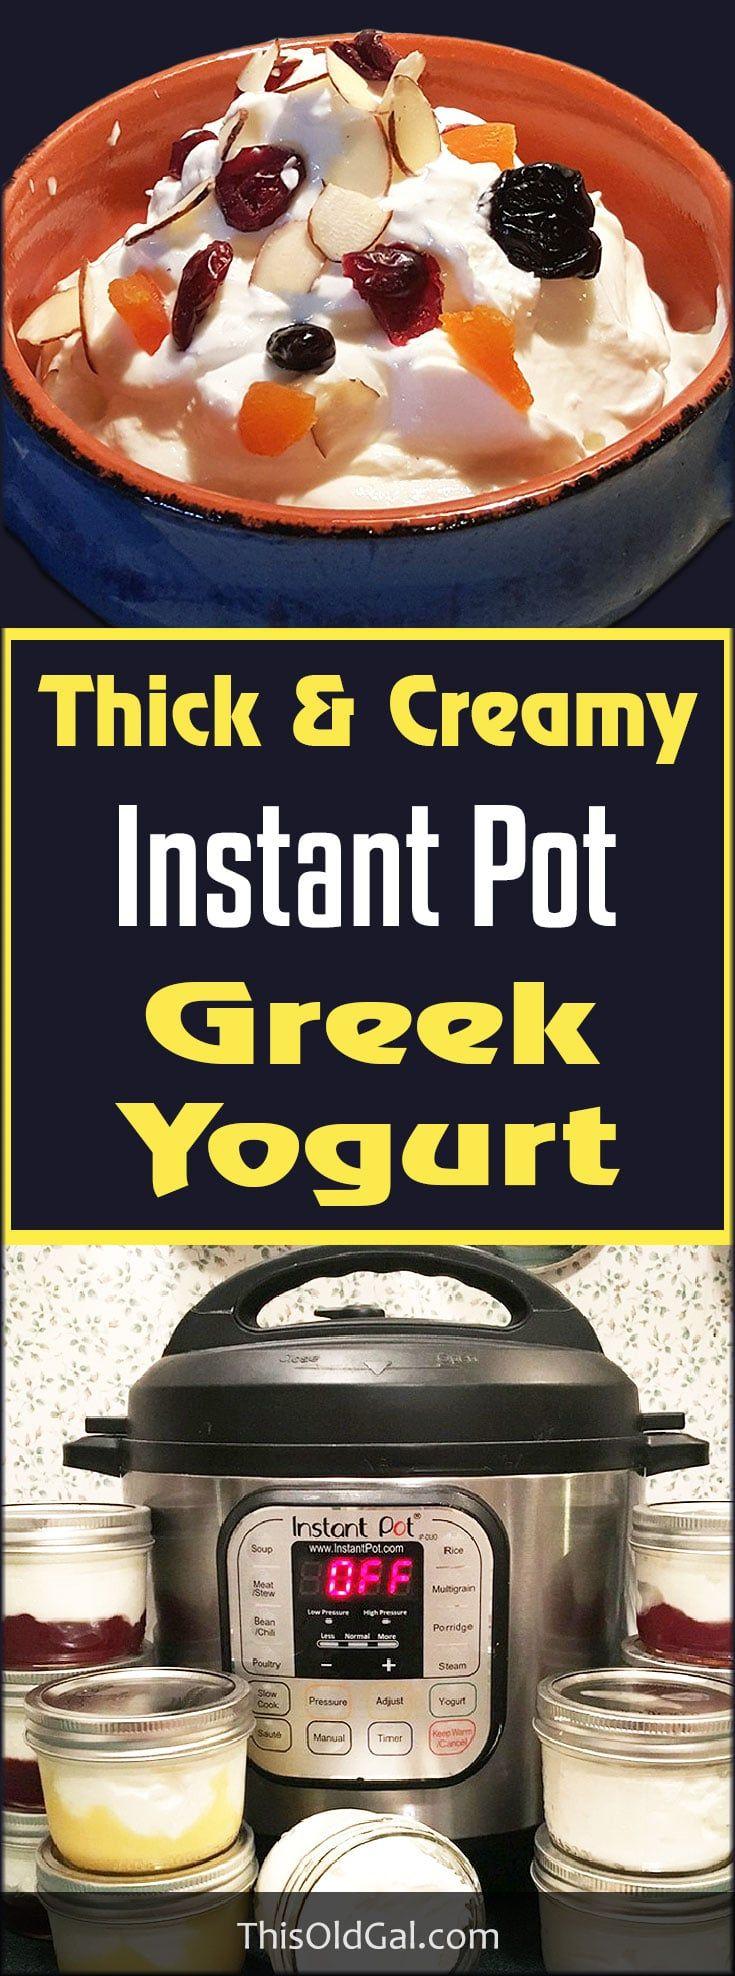 Easy Thick & Creamy Instant Pot Greek Yogurt via @thisoldgalcooks